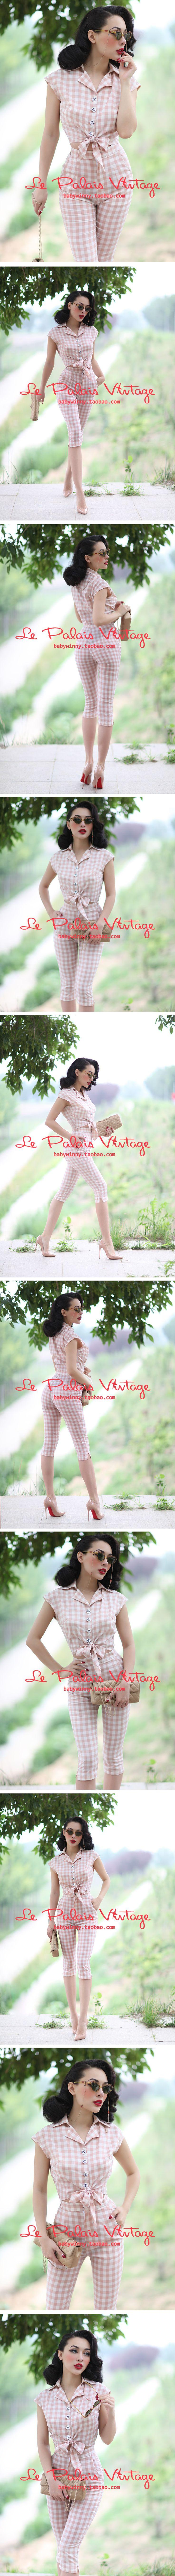 le palais vintage limited edition retro high pockets hip flesh pink plaid pants wild 7 0.15 Taobao global Station